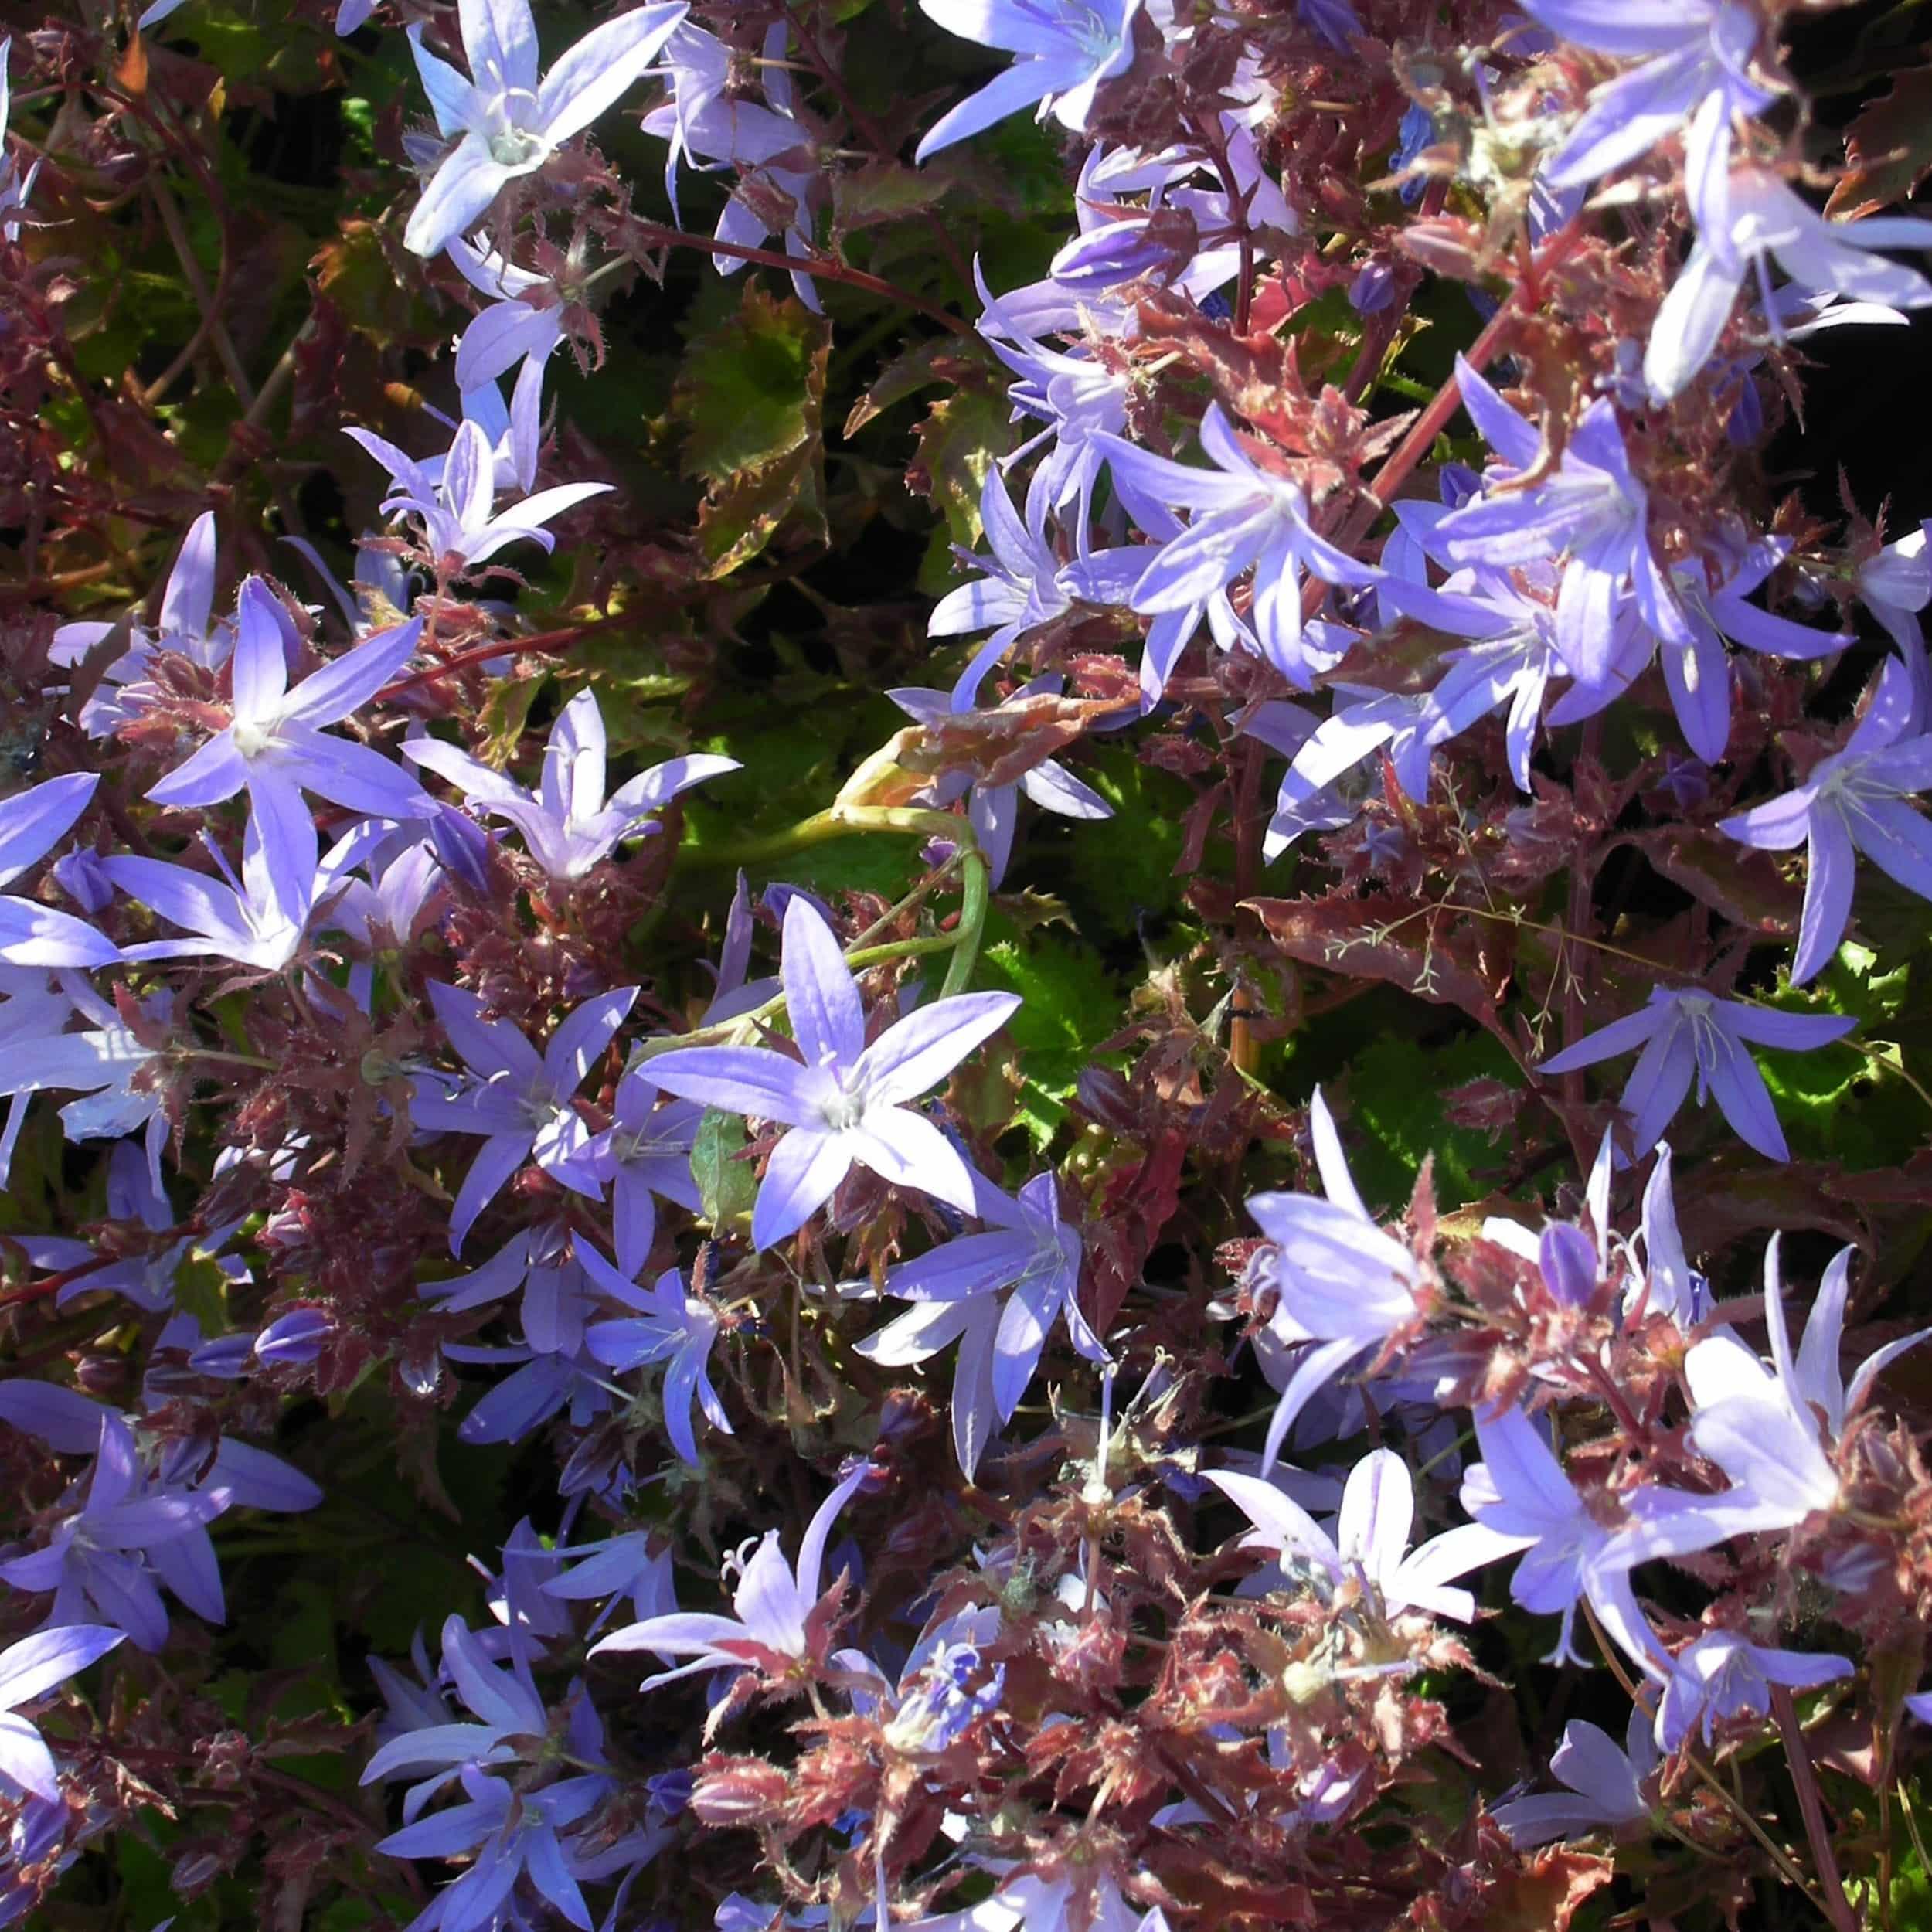 Campanula poscharskyana 'Blauranke' - Hängepolsterglockenblume